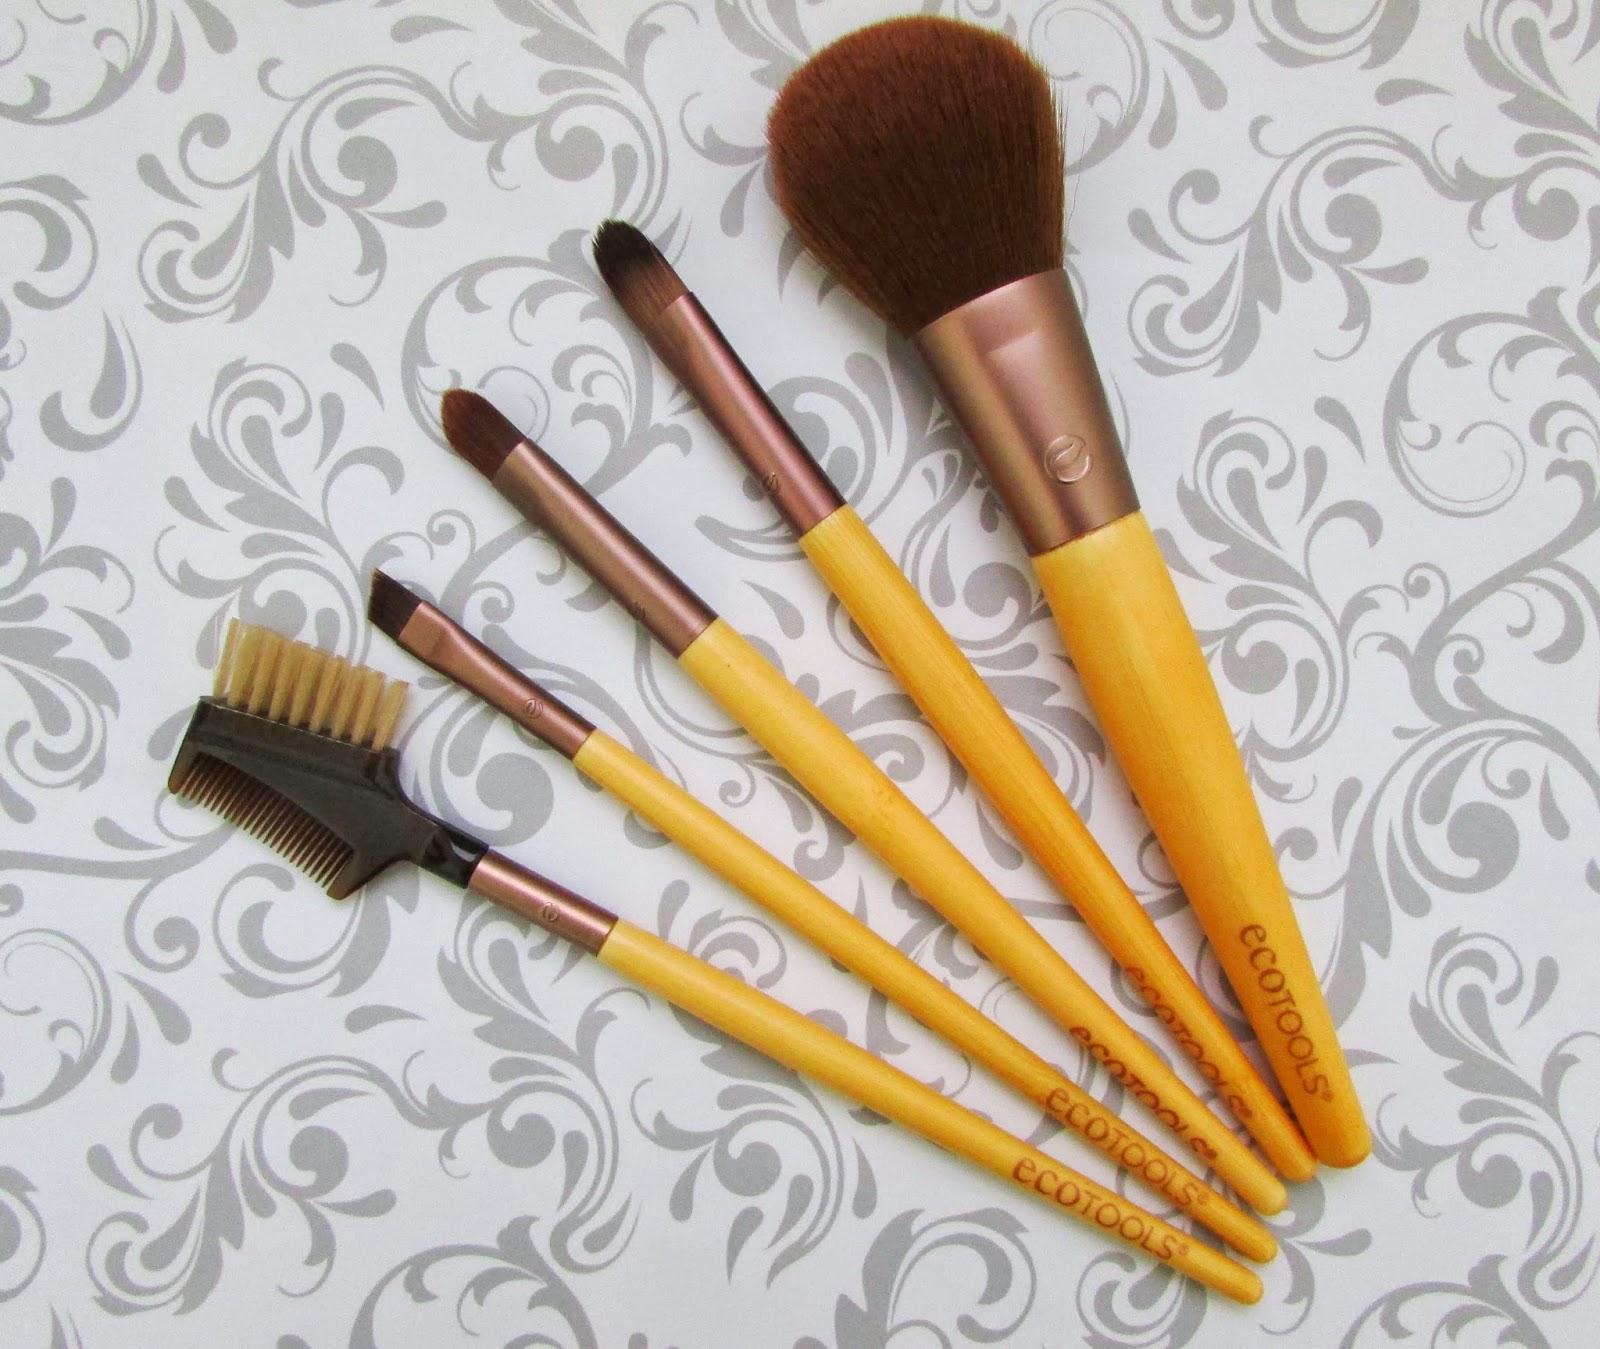 Kit, pincéis básicos, olhos, maquiagem, EcoTools